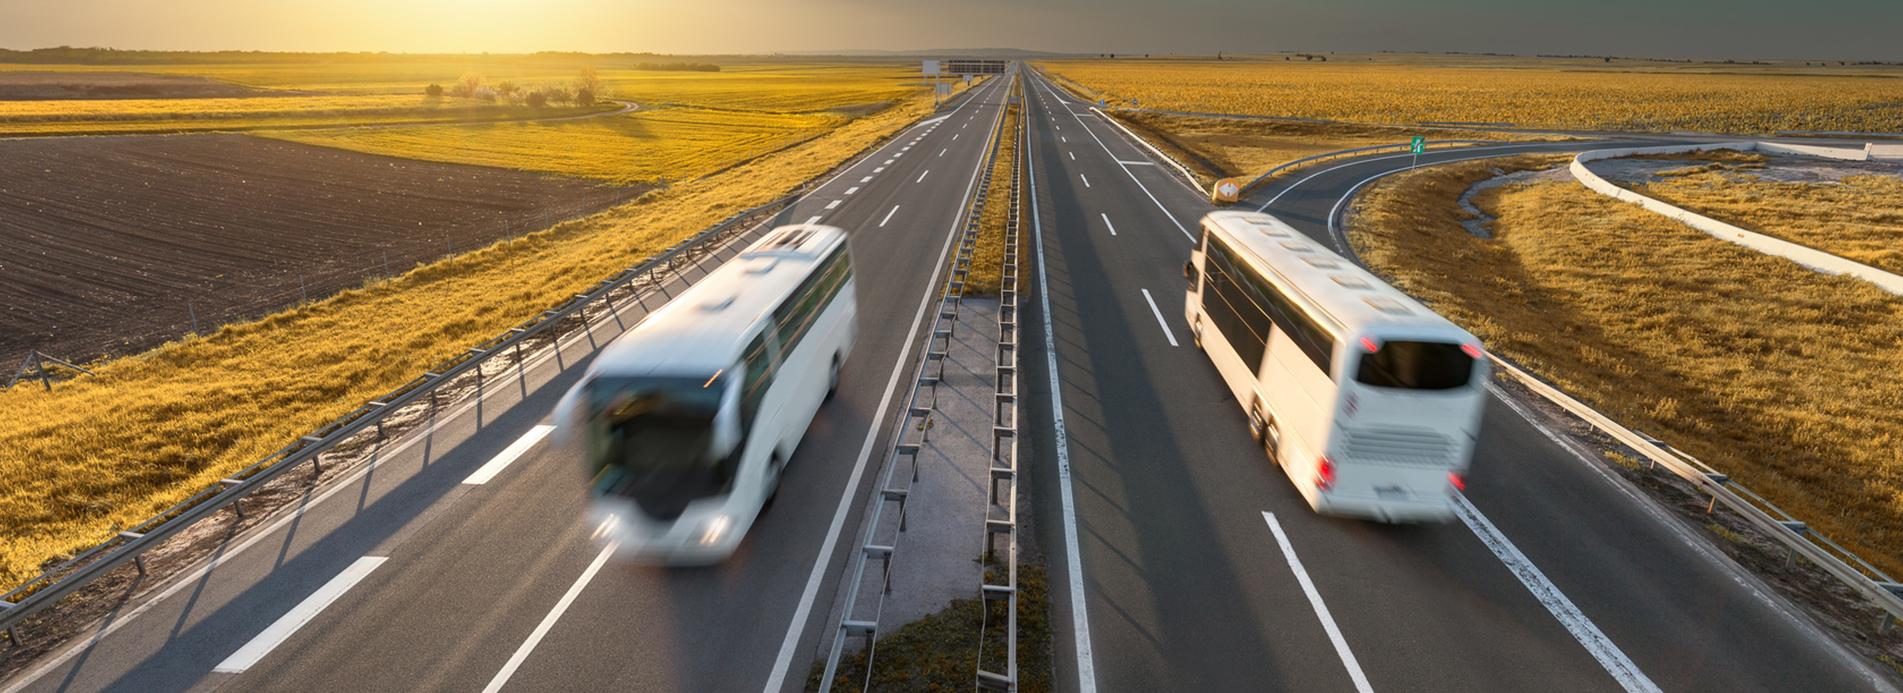 Bus-Advanced-Security-Concept-aguila